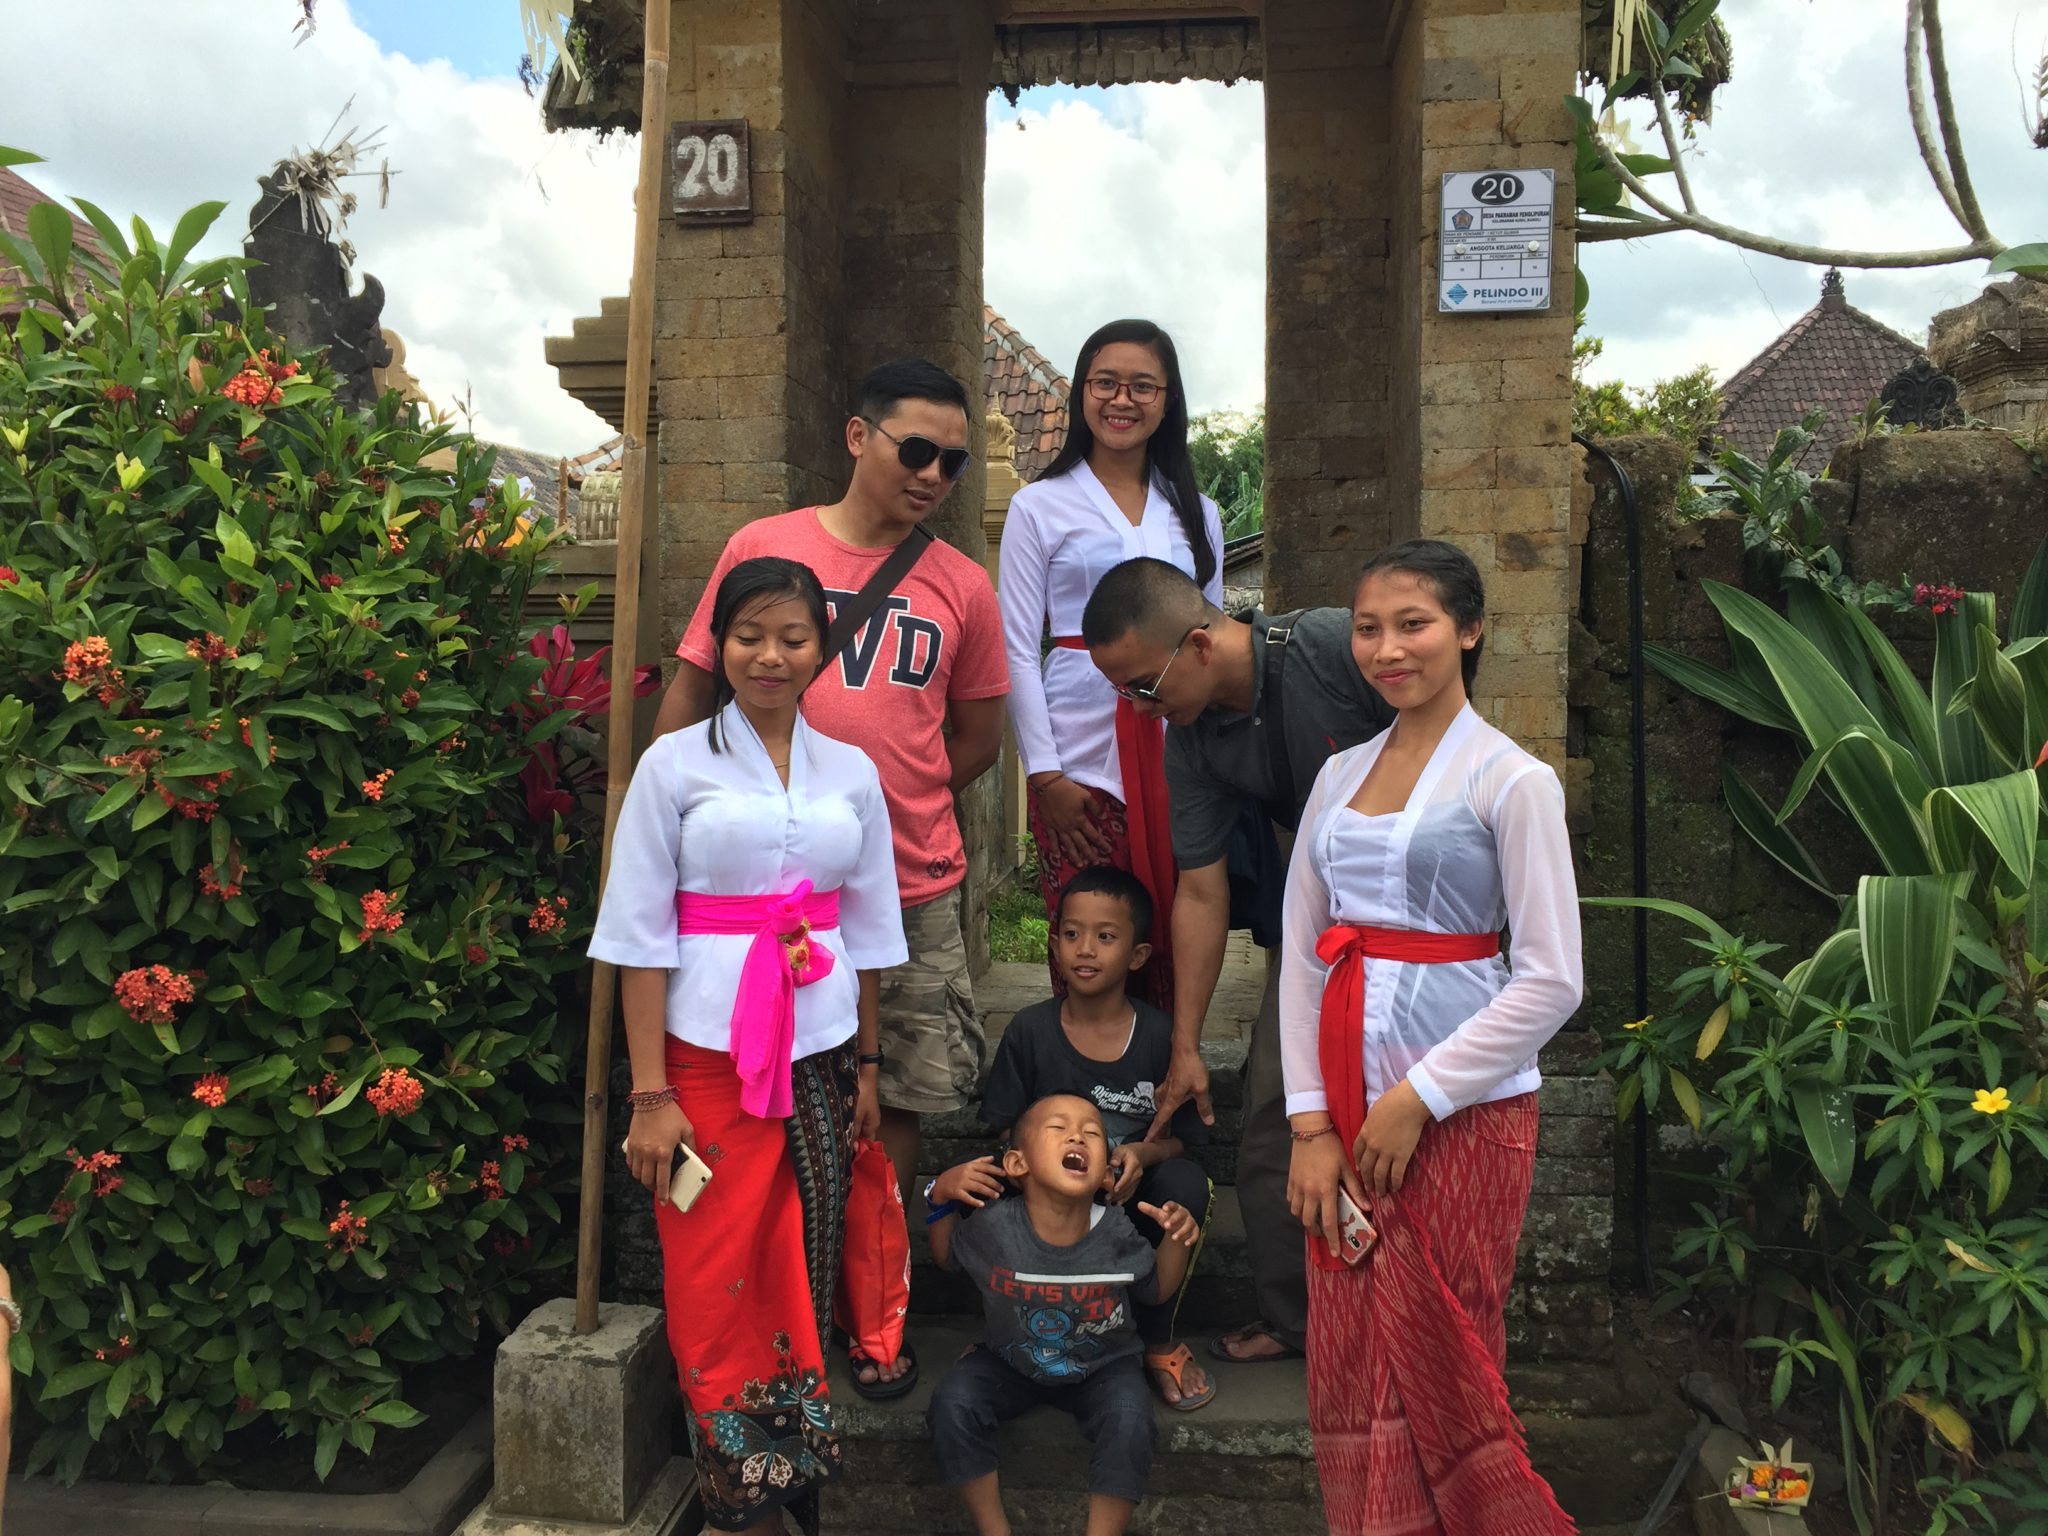 4WD Bali Volcano Adventure: Mount Batur Private Full Day Tour